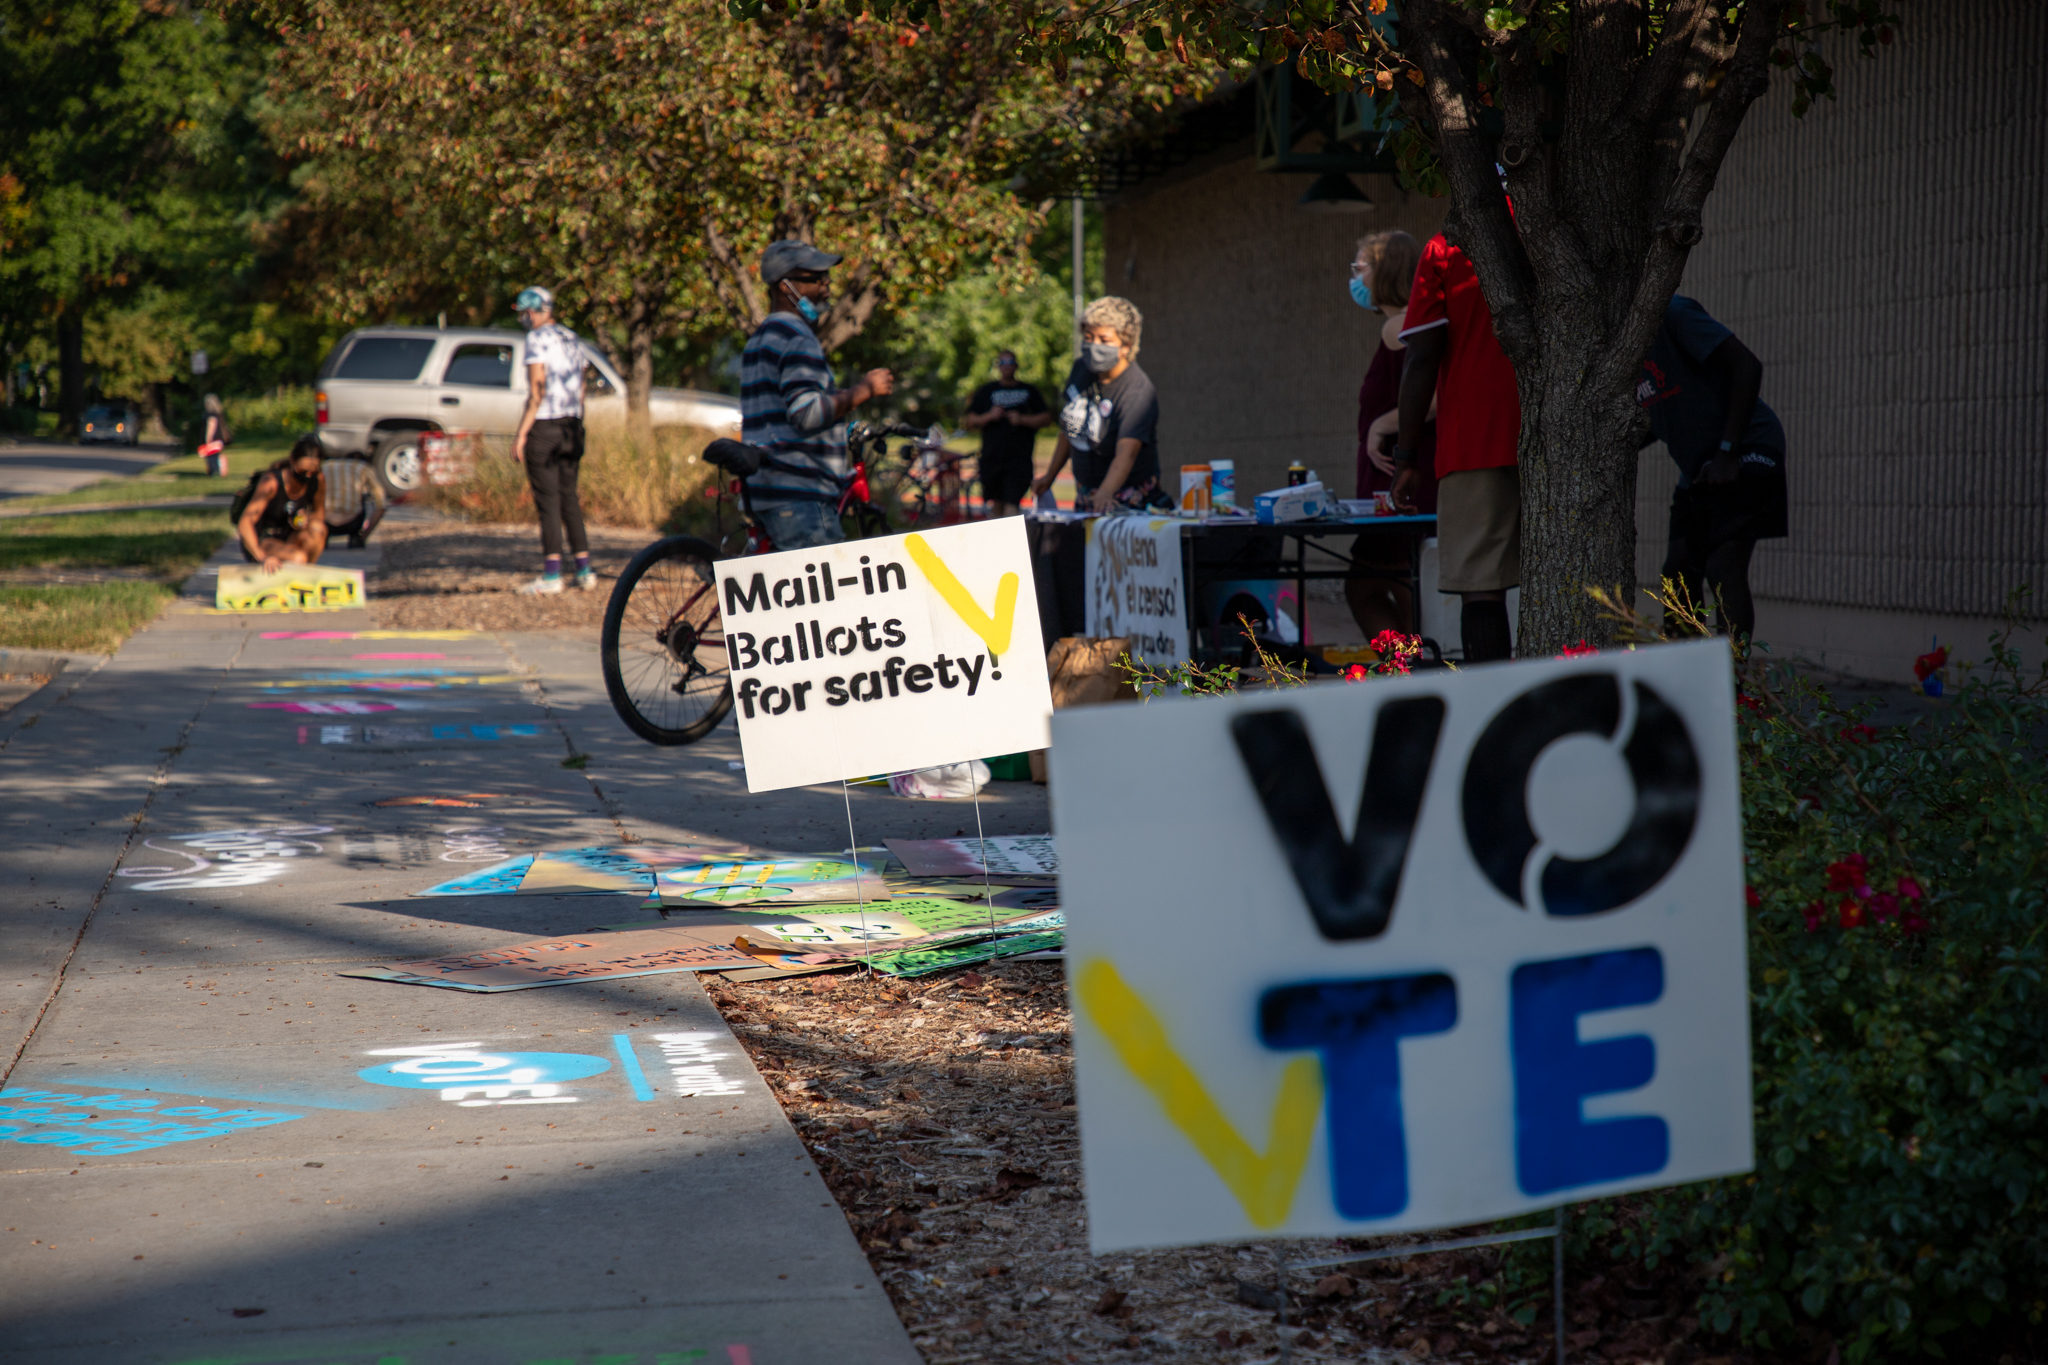 IMG 0062 1 - Voting education through art at Census, Art, Vote!